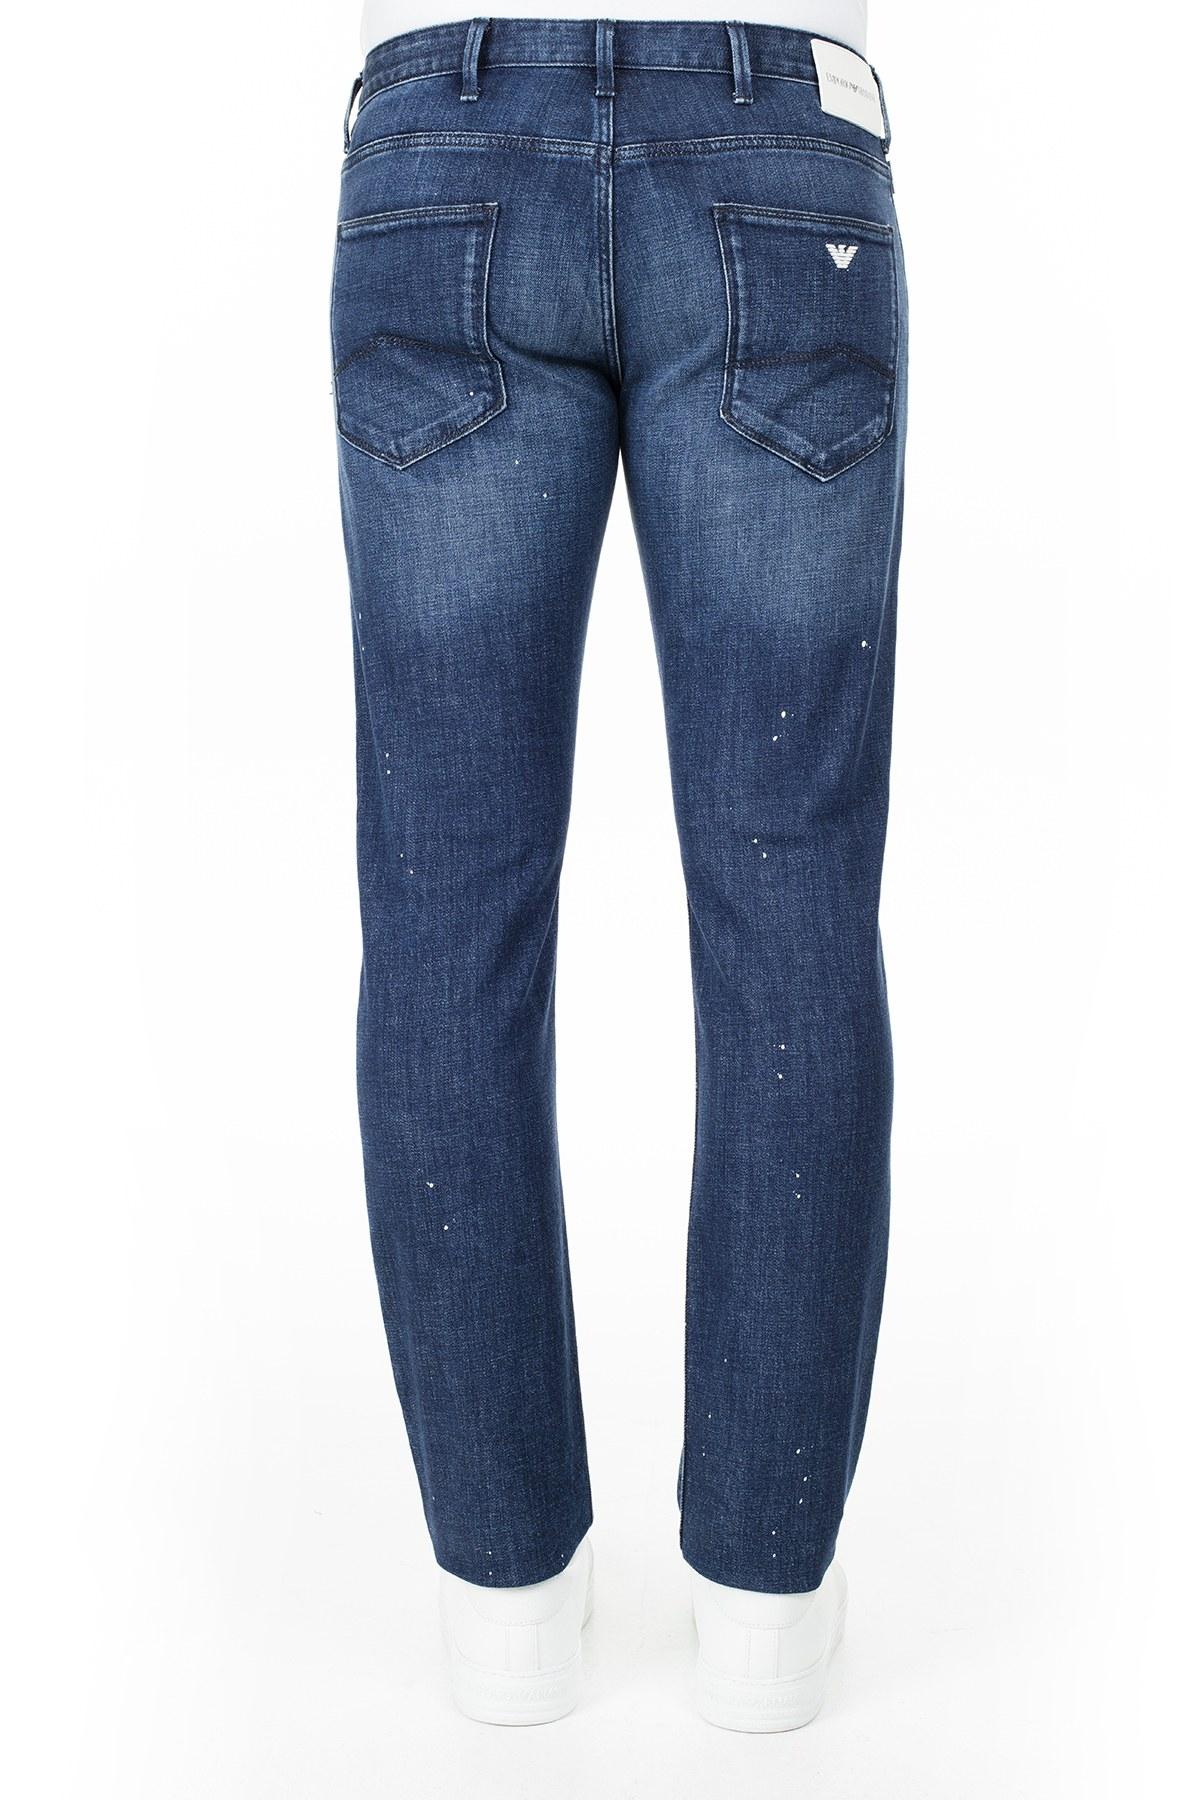 Emporio Armani J06 Jeans Erkek Kot Pantolon 3H1J06 1D9SZ F977 LACİVERT